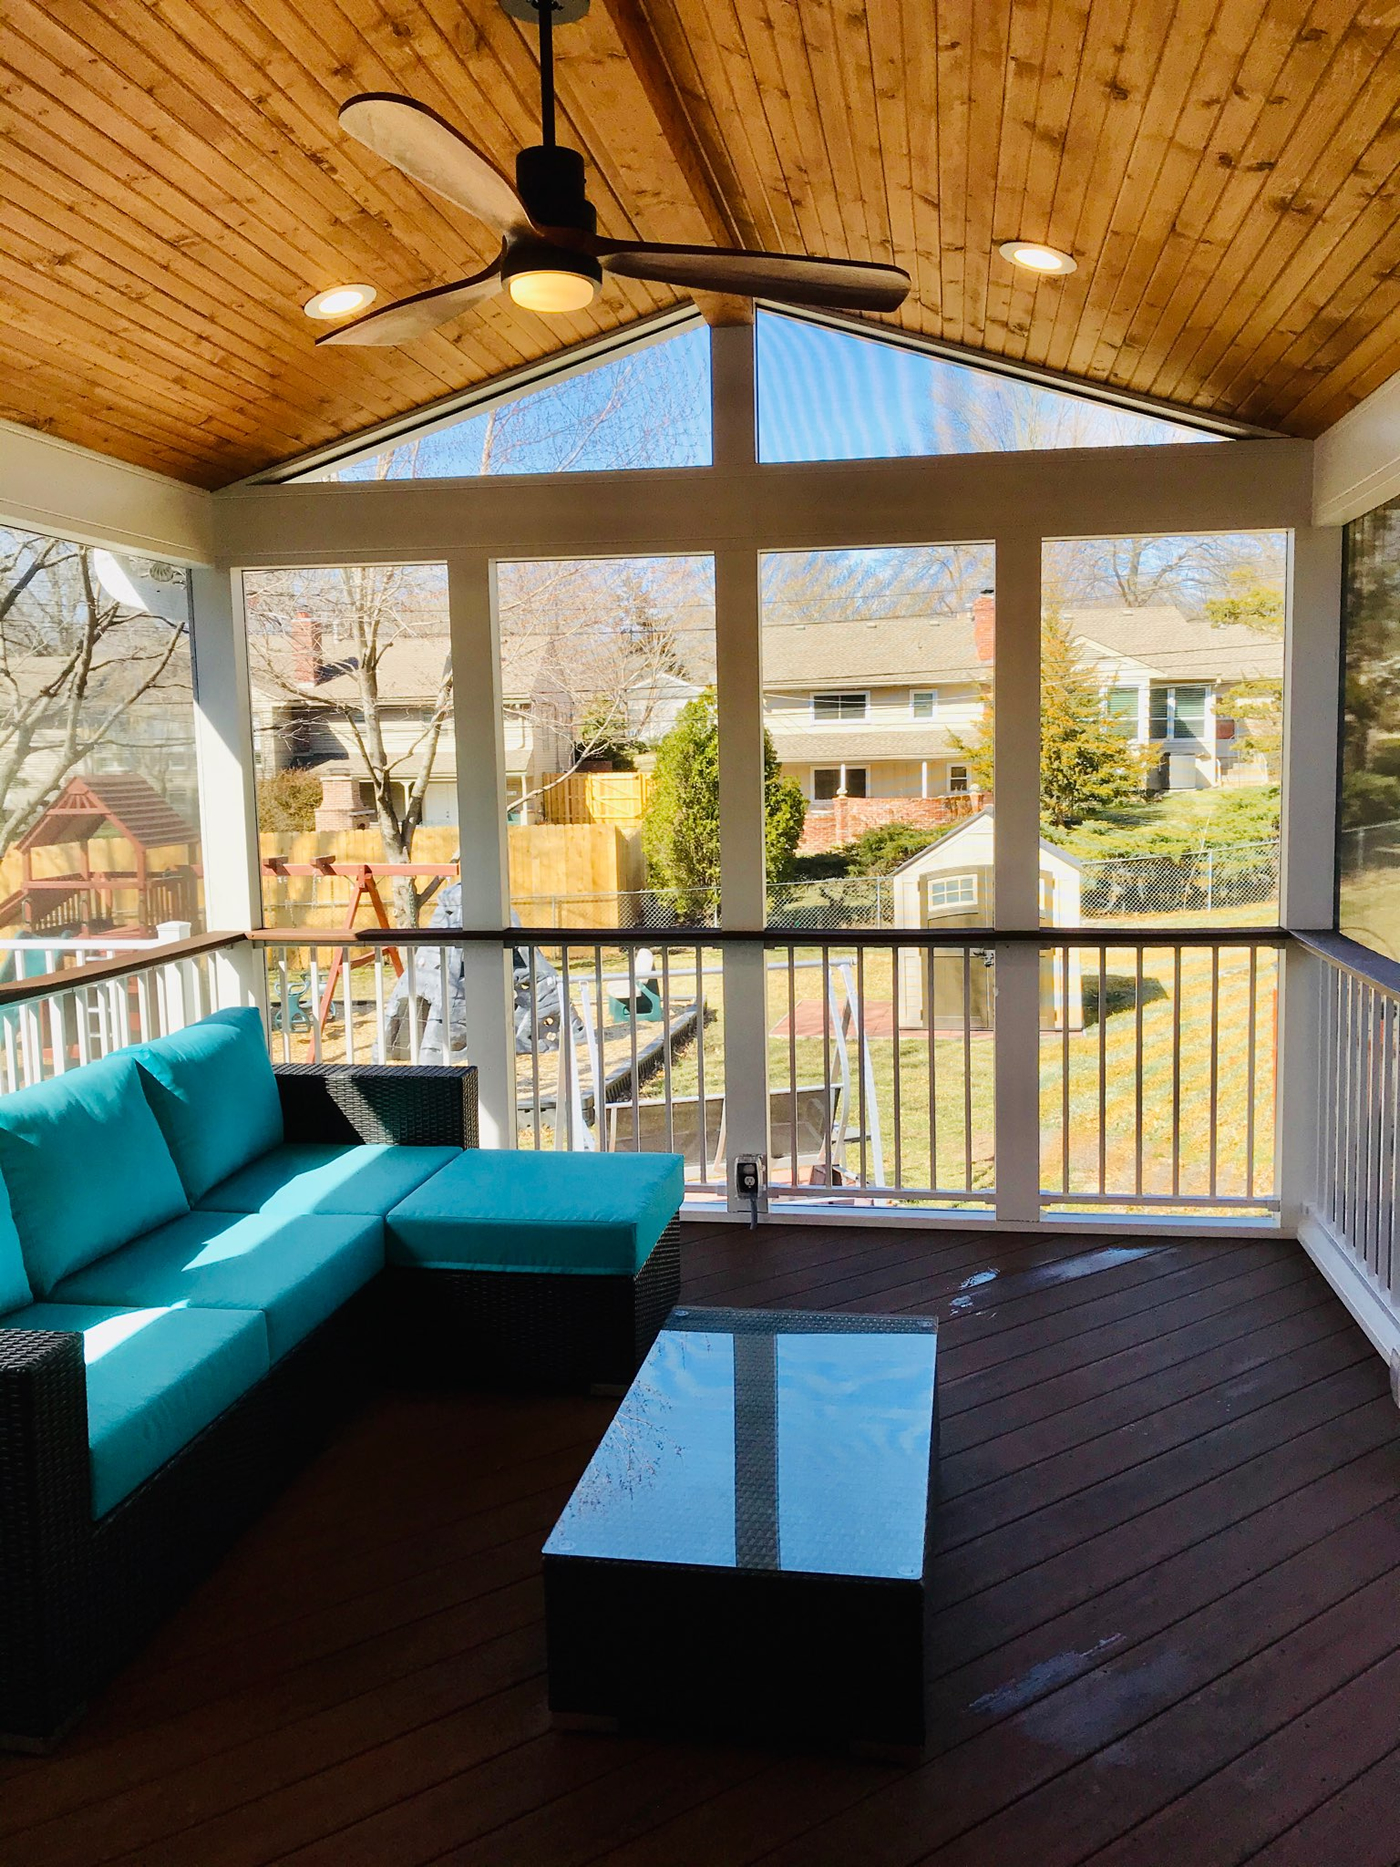 Overland Park porch interior